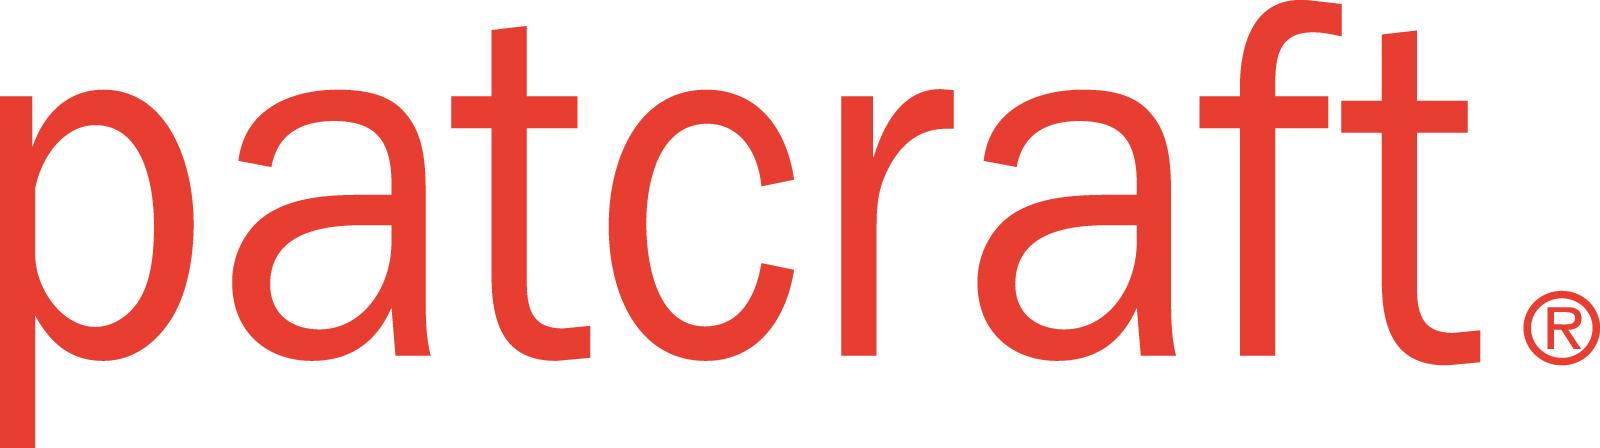 Patcraft_logo_highres.jpg